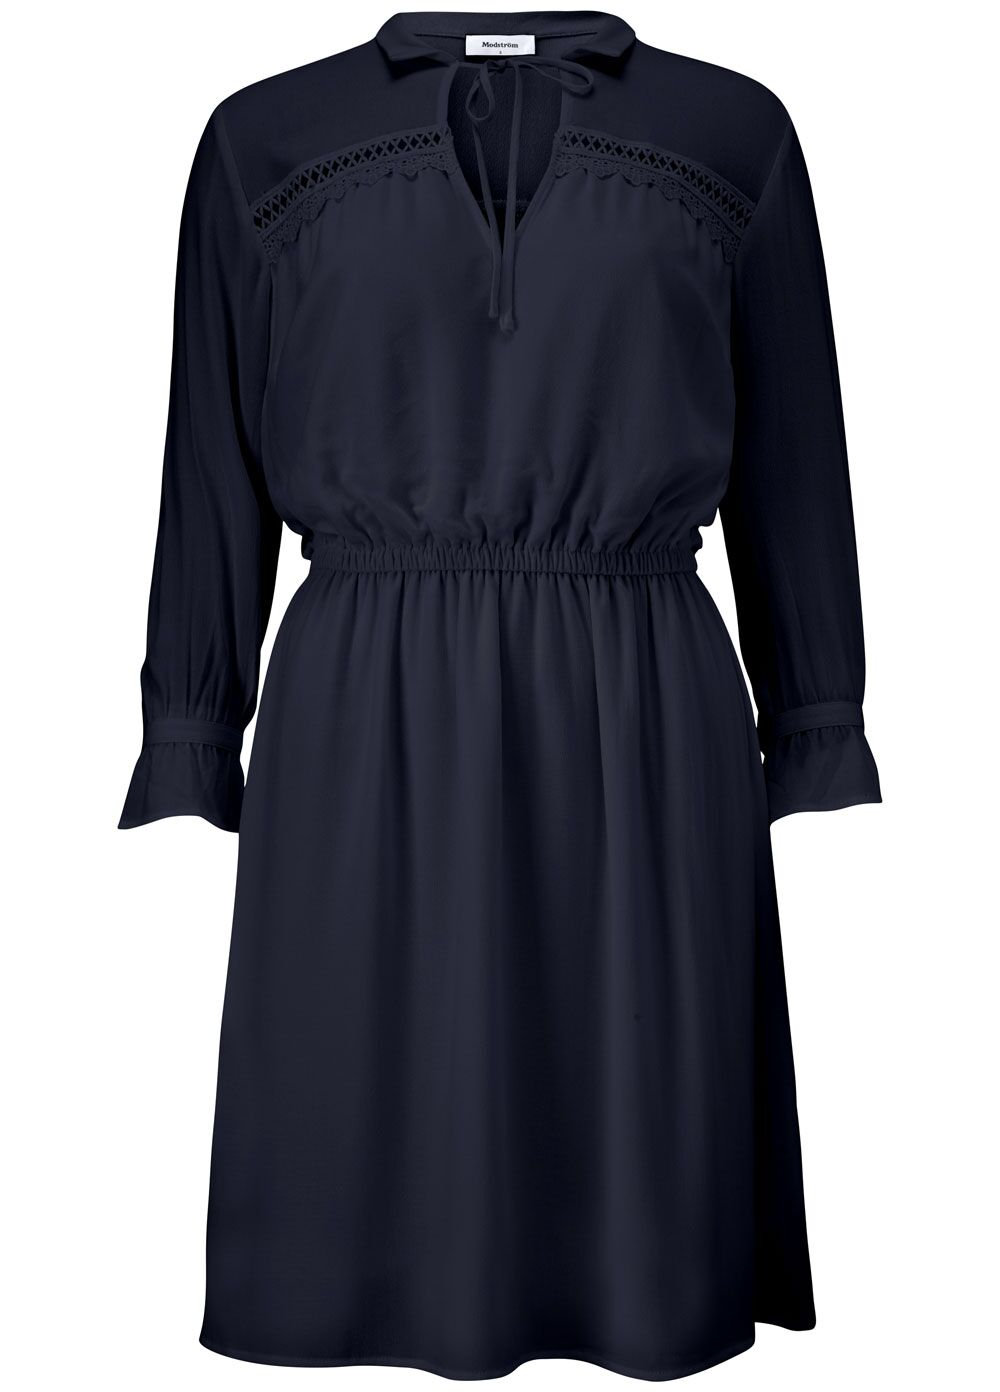 Noa Dress - Navy Ský